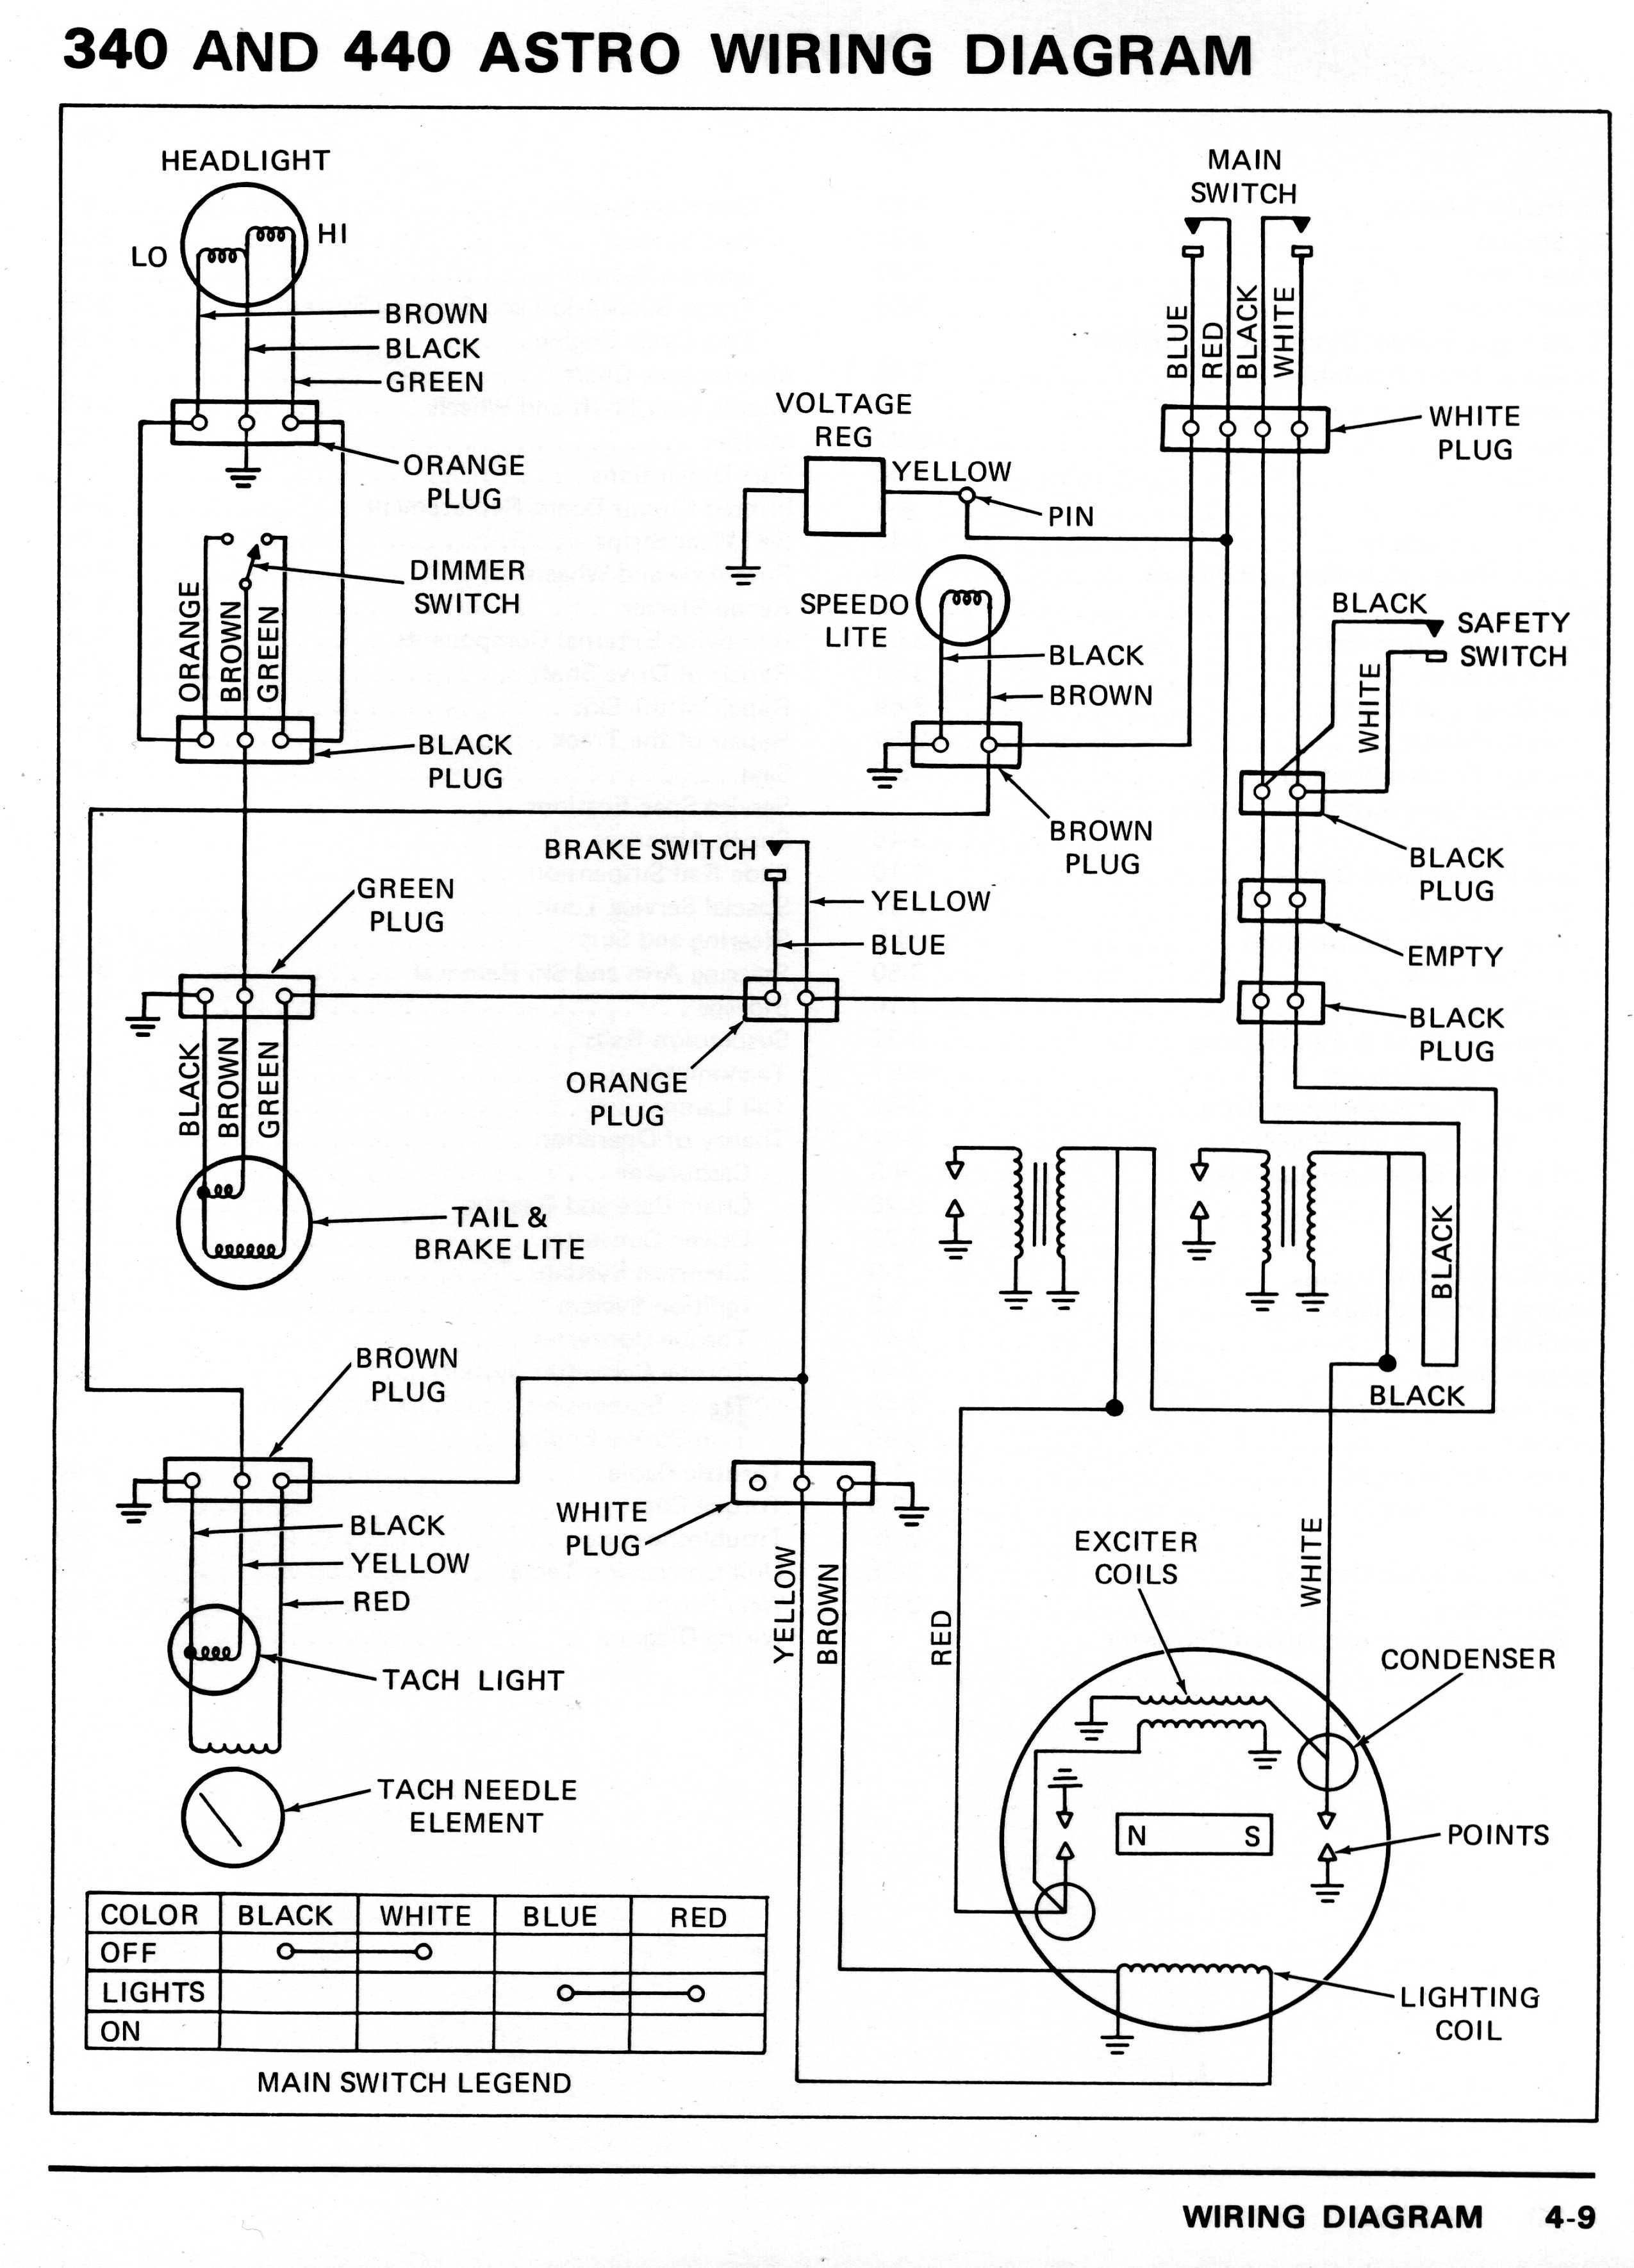 1977 Kawasaki Astro SA340/440-A1 Wiring Diagrams